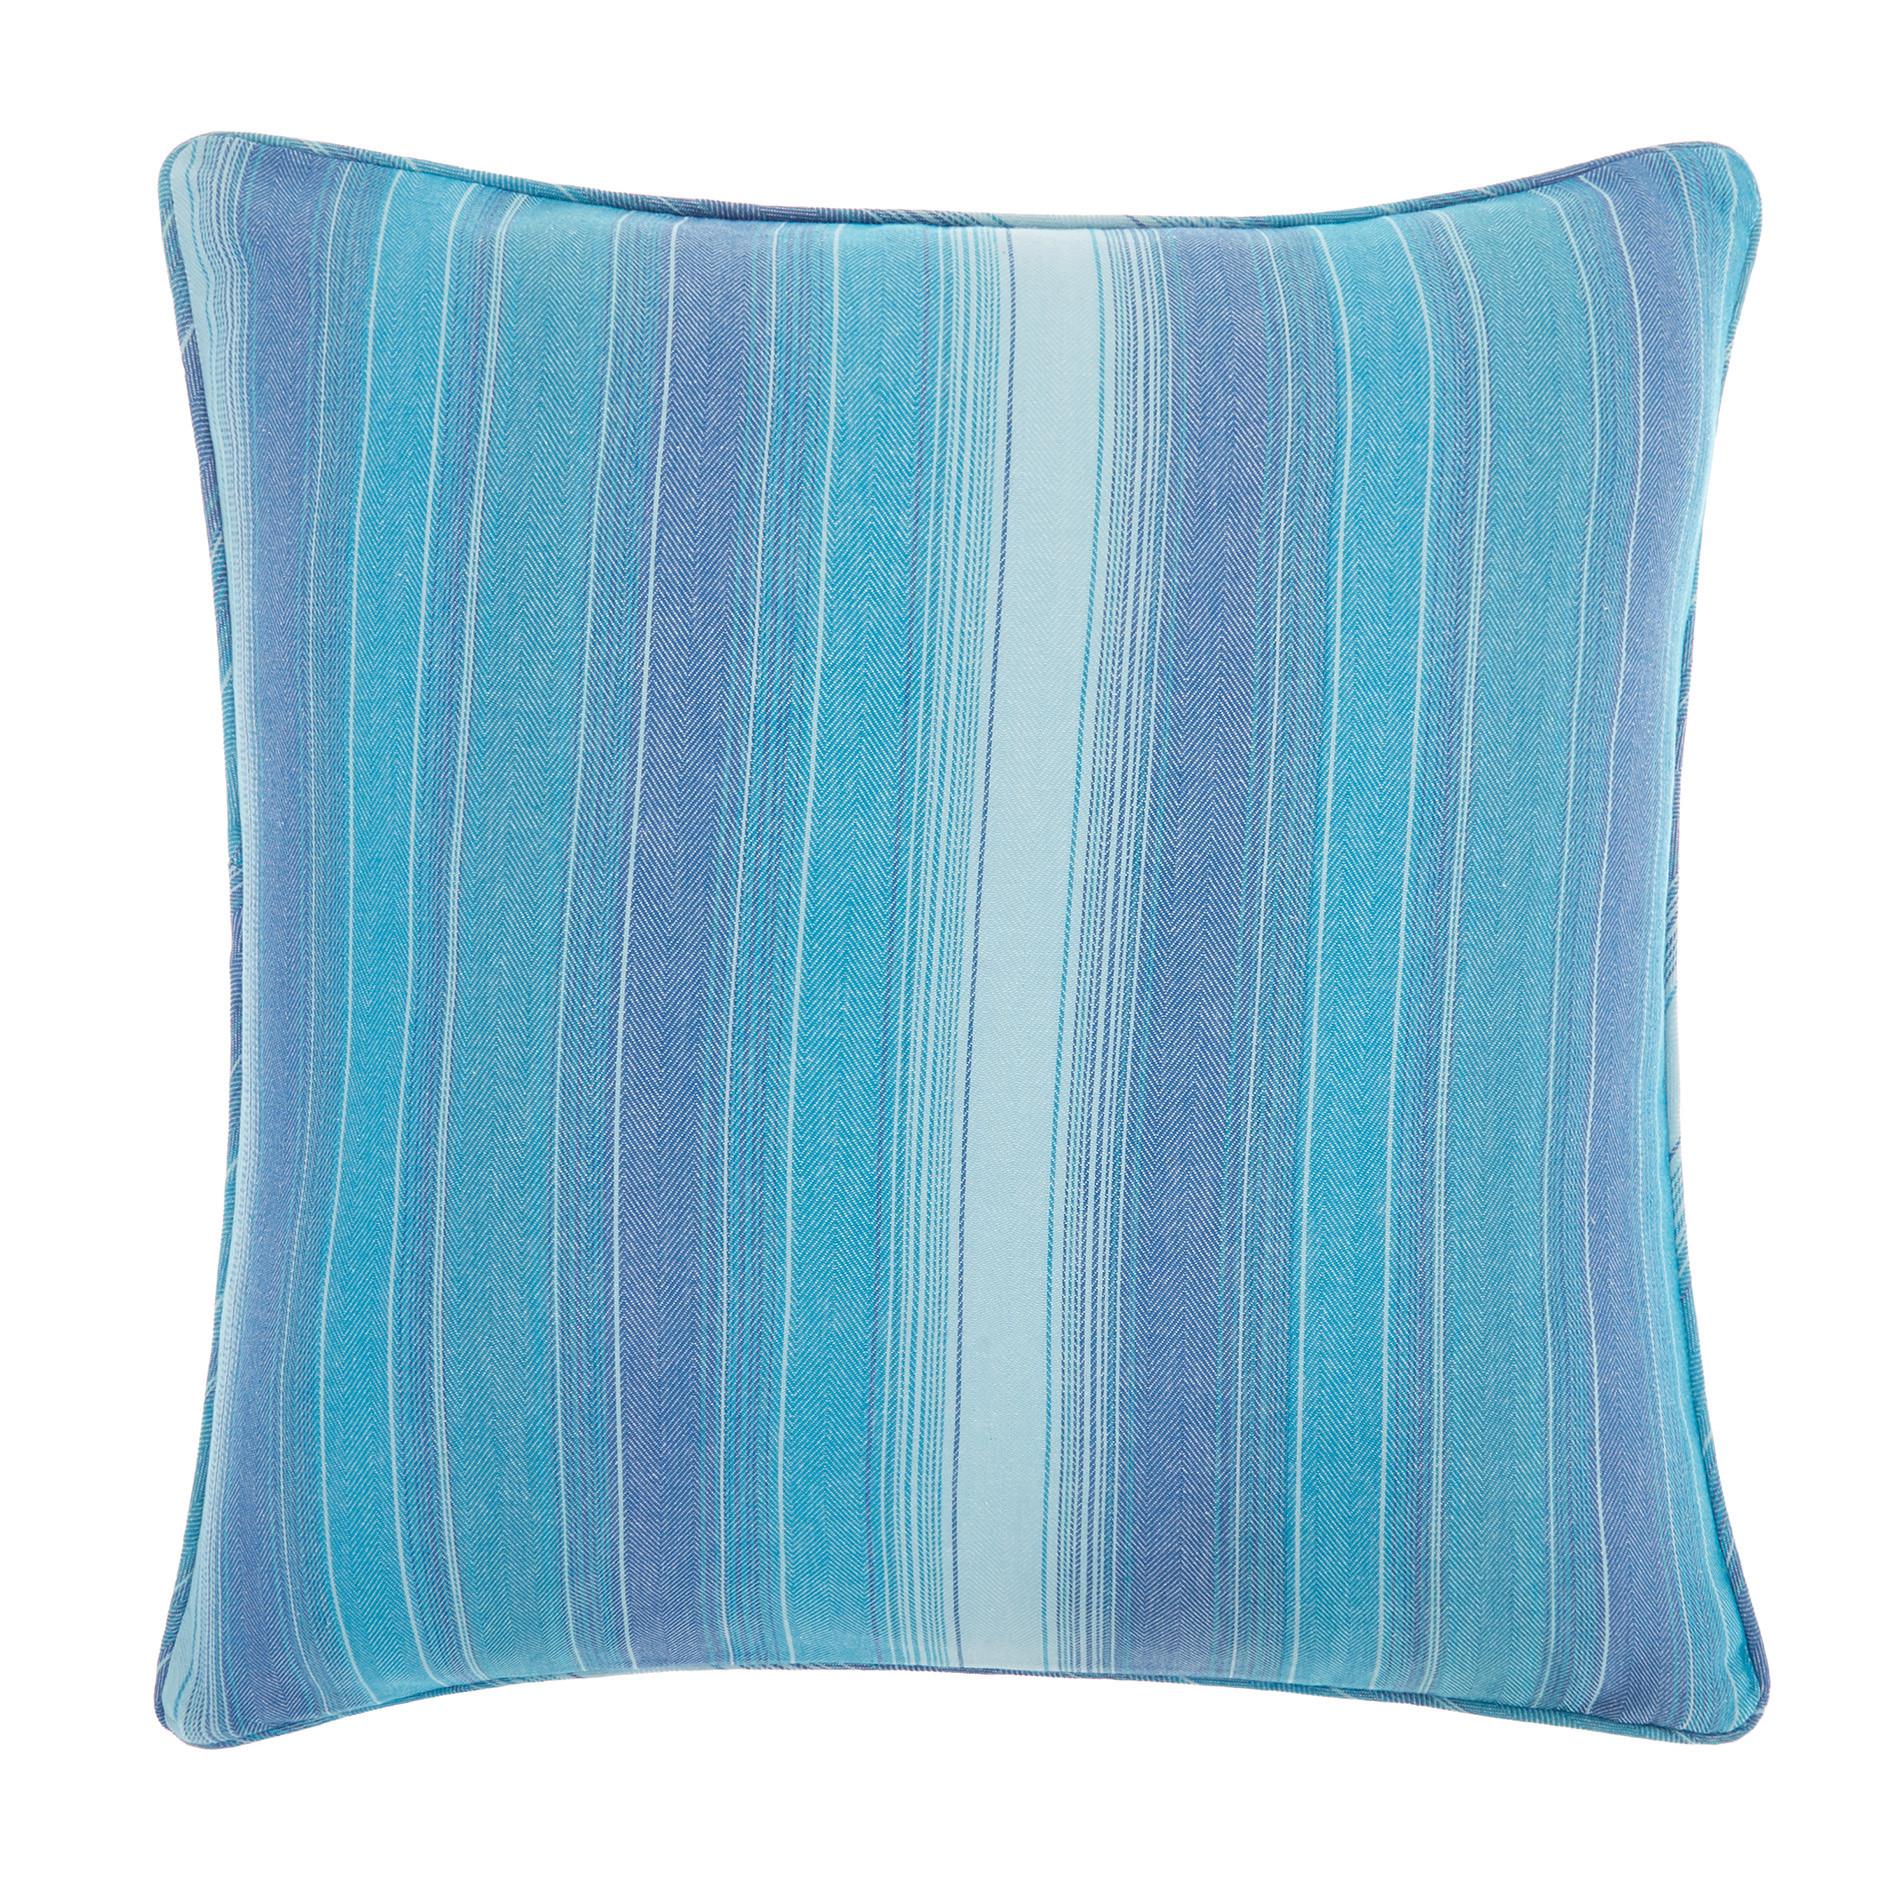 Cuscino puro cotone a righe, Azzurro, large image number 0